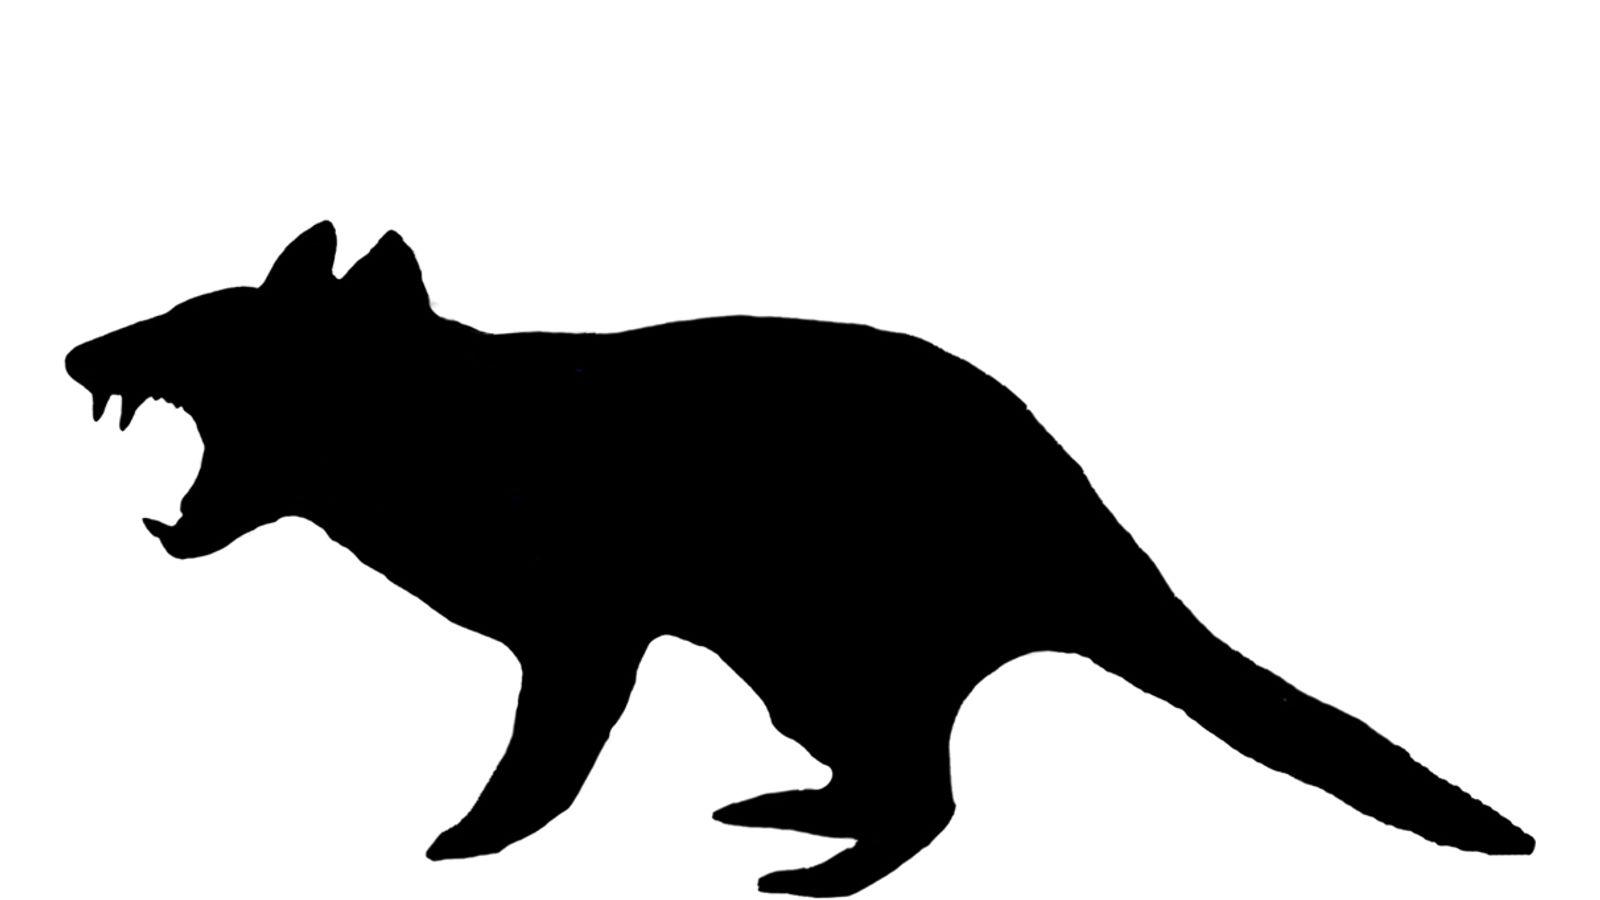 ancient flesh eating beast found in australia tasmanian devil clipart black and white tasmanian devil clipart